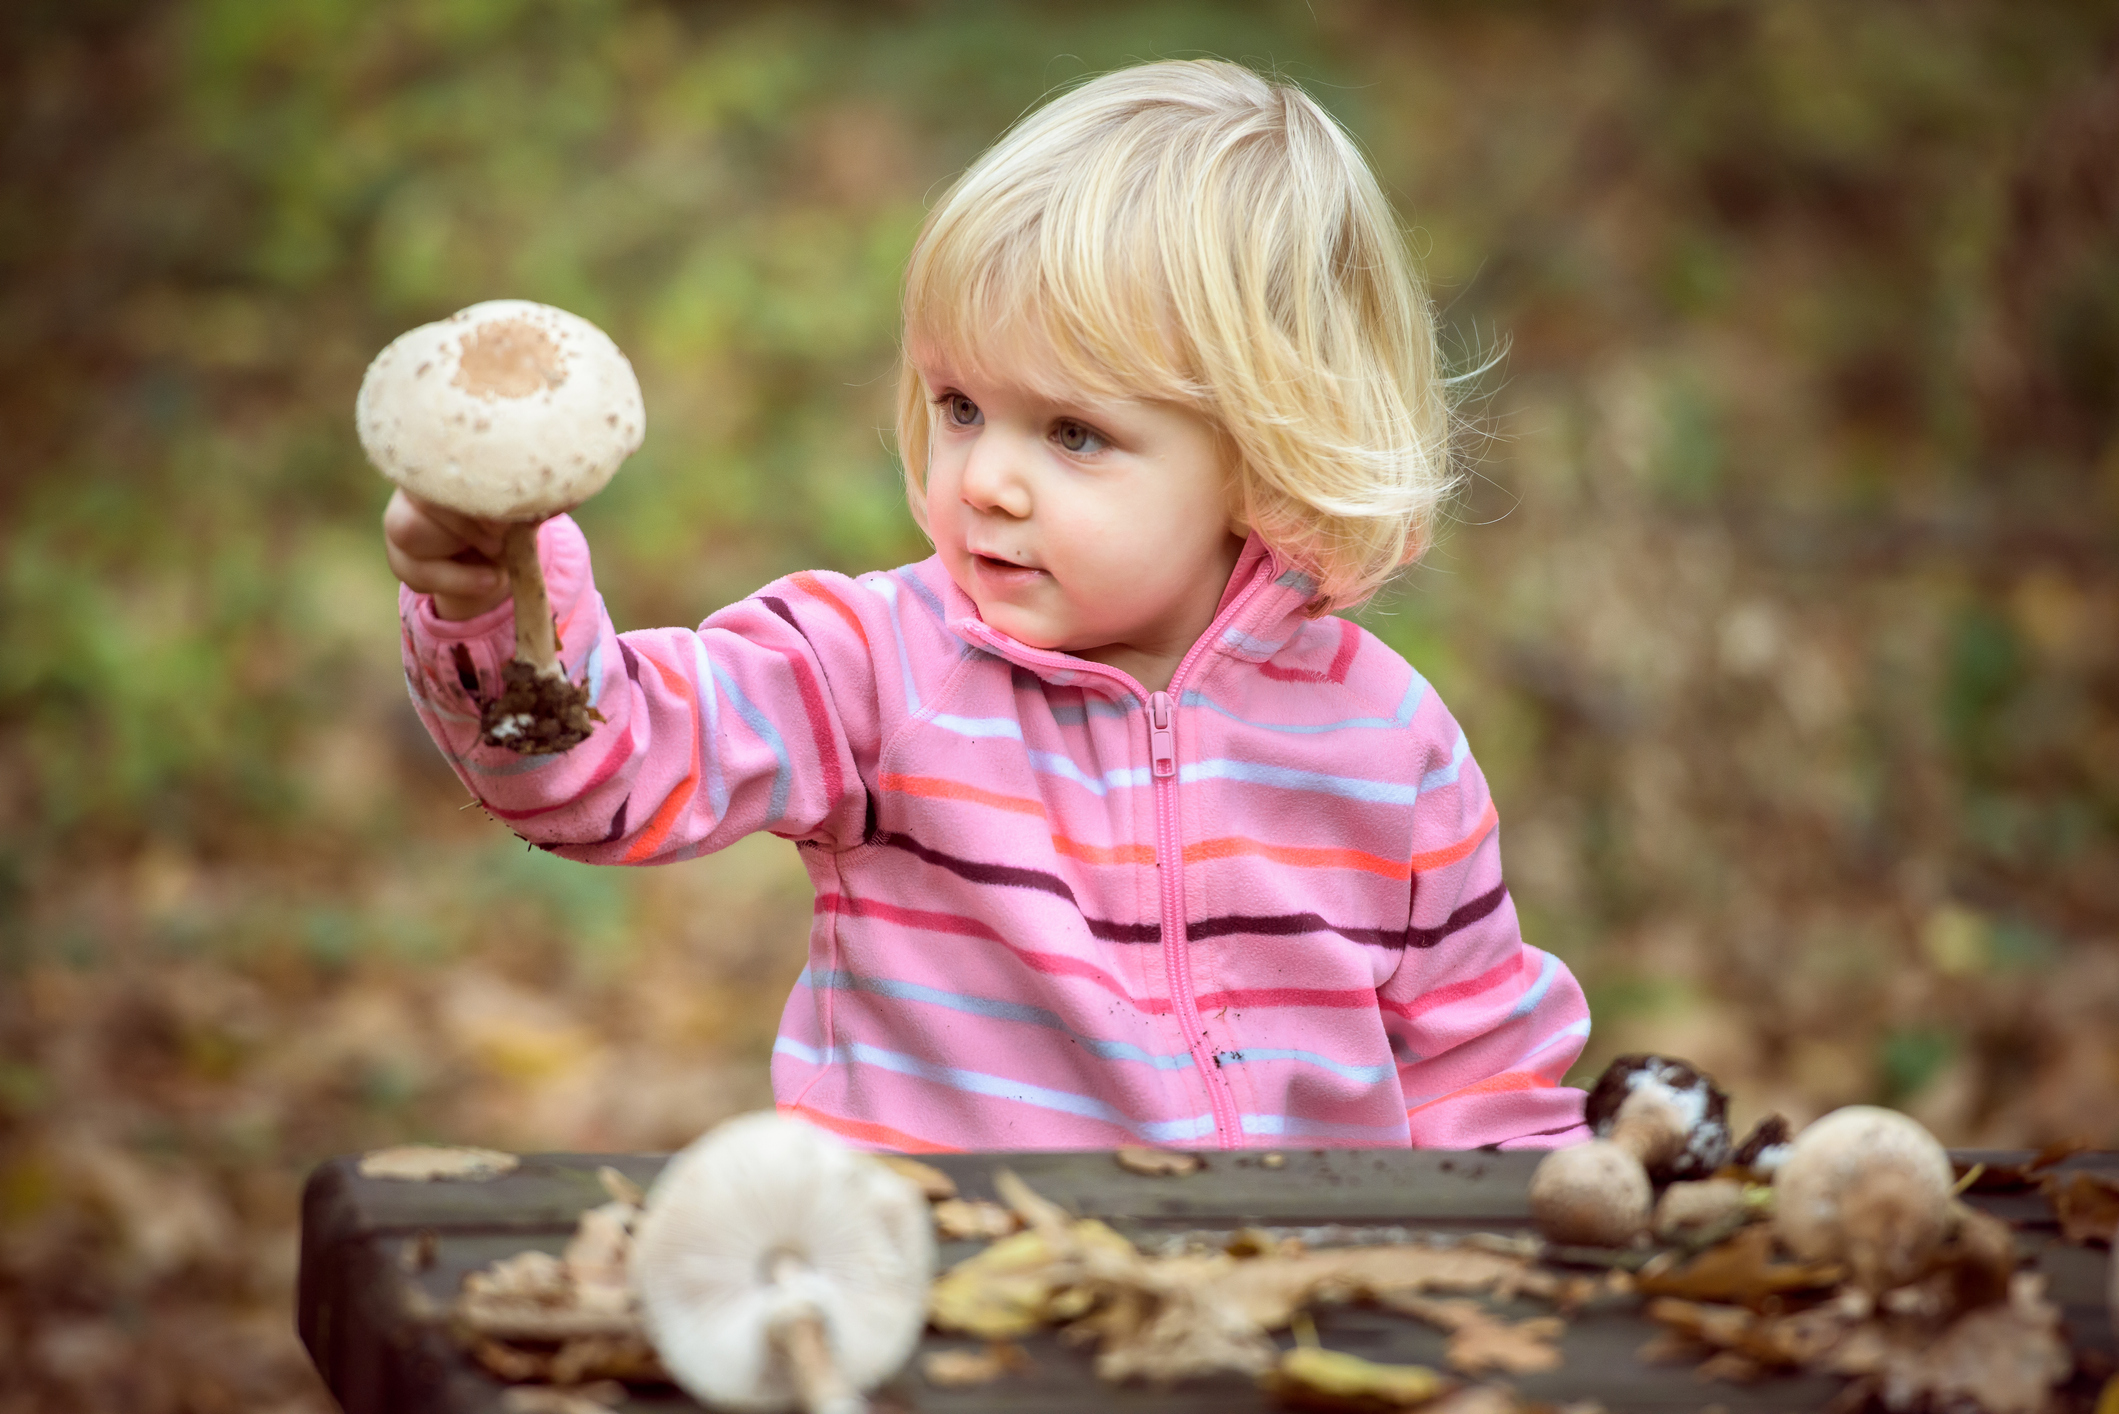 Little girl looking parasol mushrooms